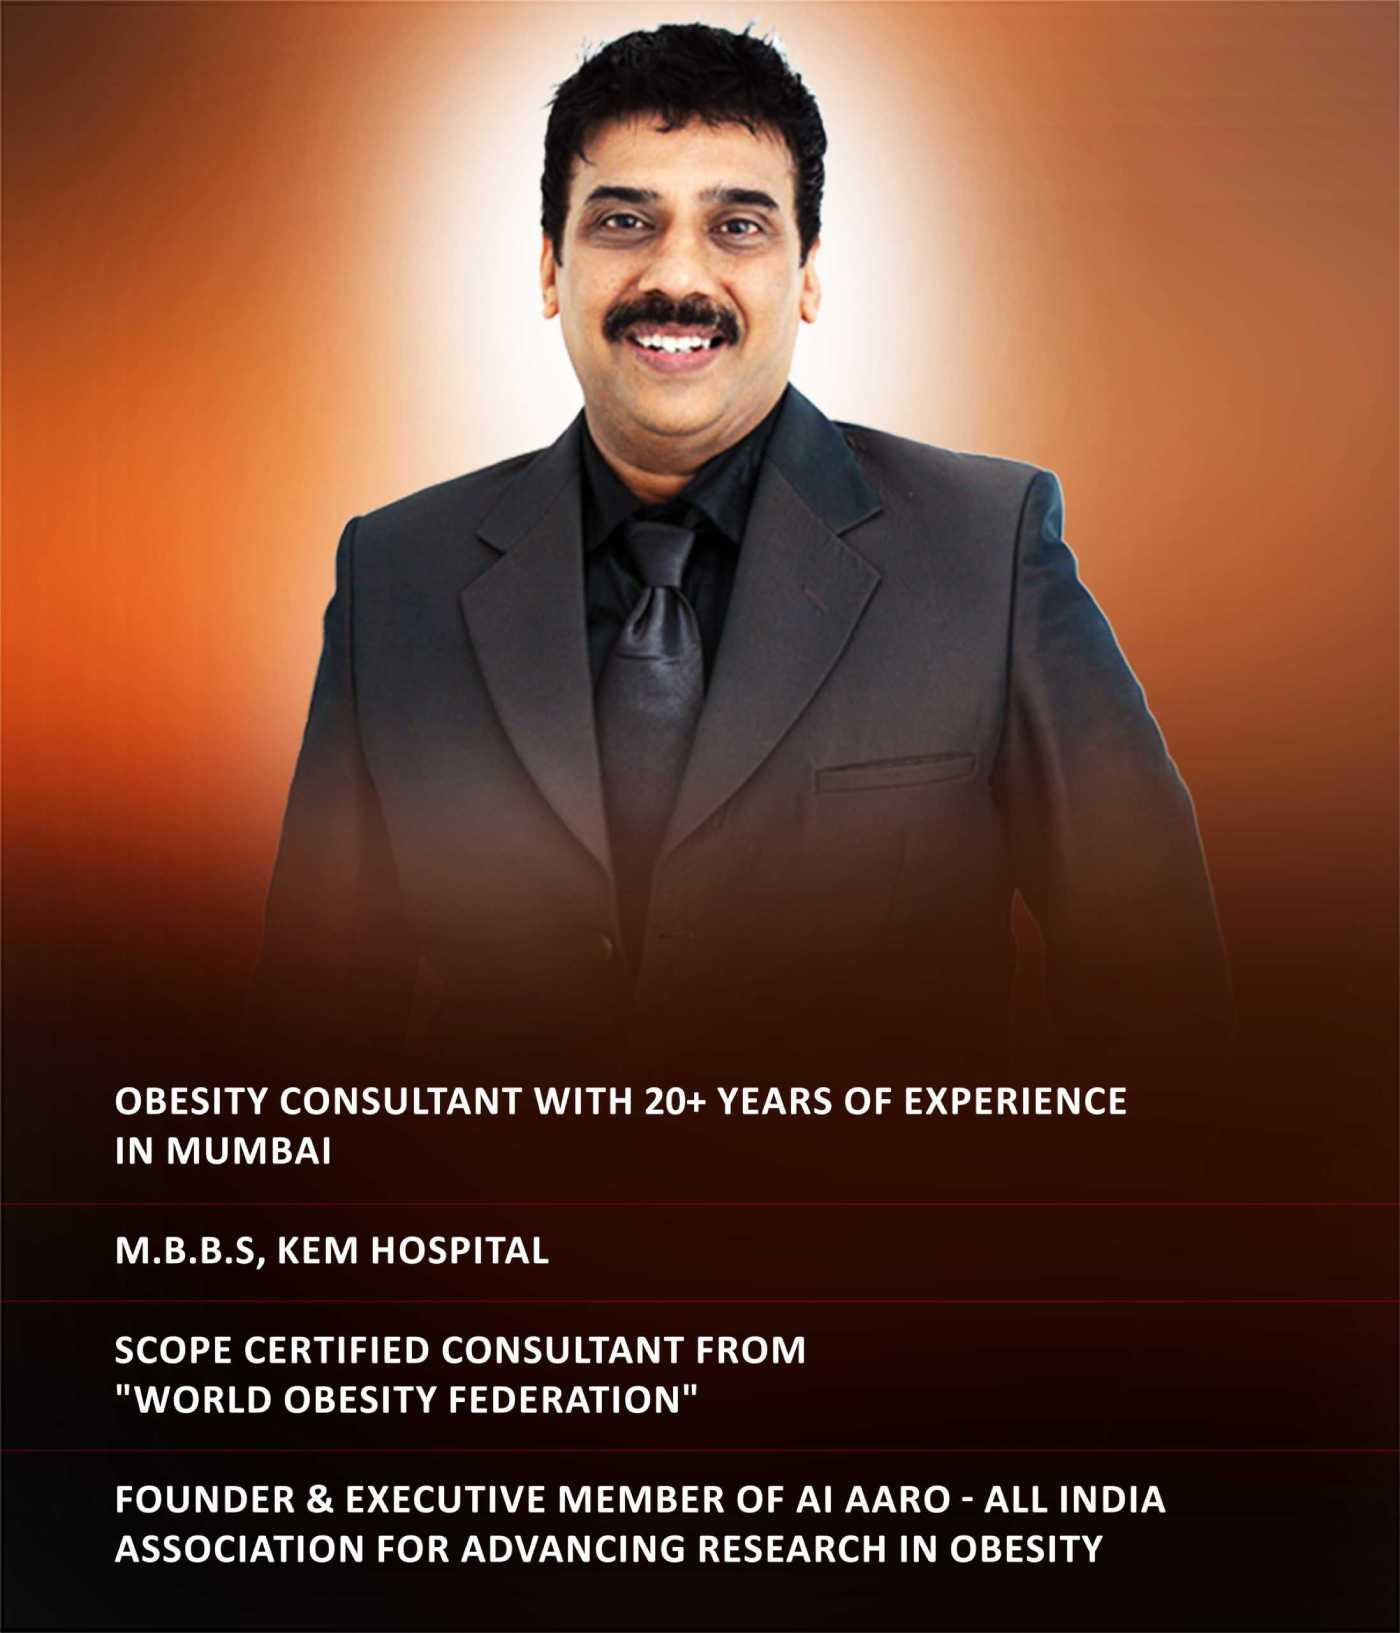 weight loss clinic in mumbai U Lipolysis how to reduce tummy tuck shape u clinic mulund u lipo Shape U Clinic u lipolysis treatment in mumbai